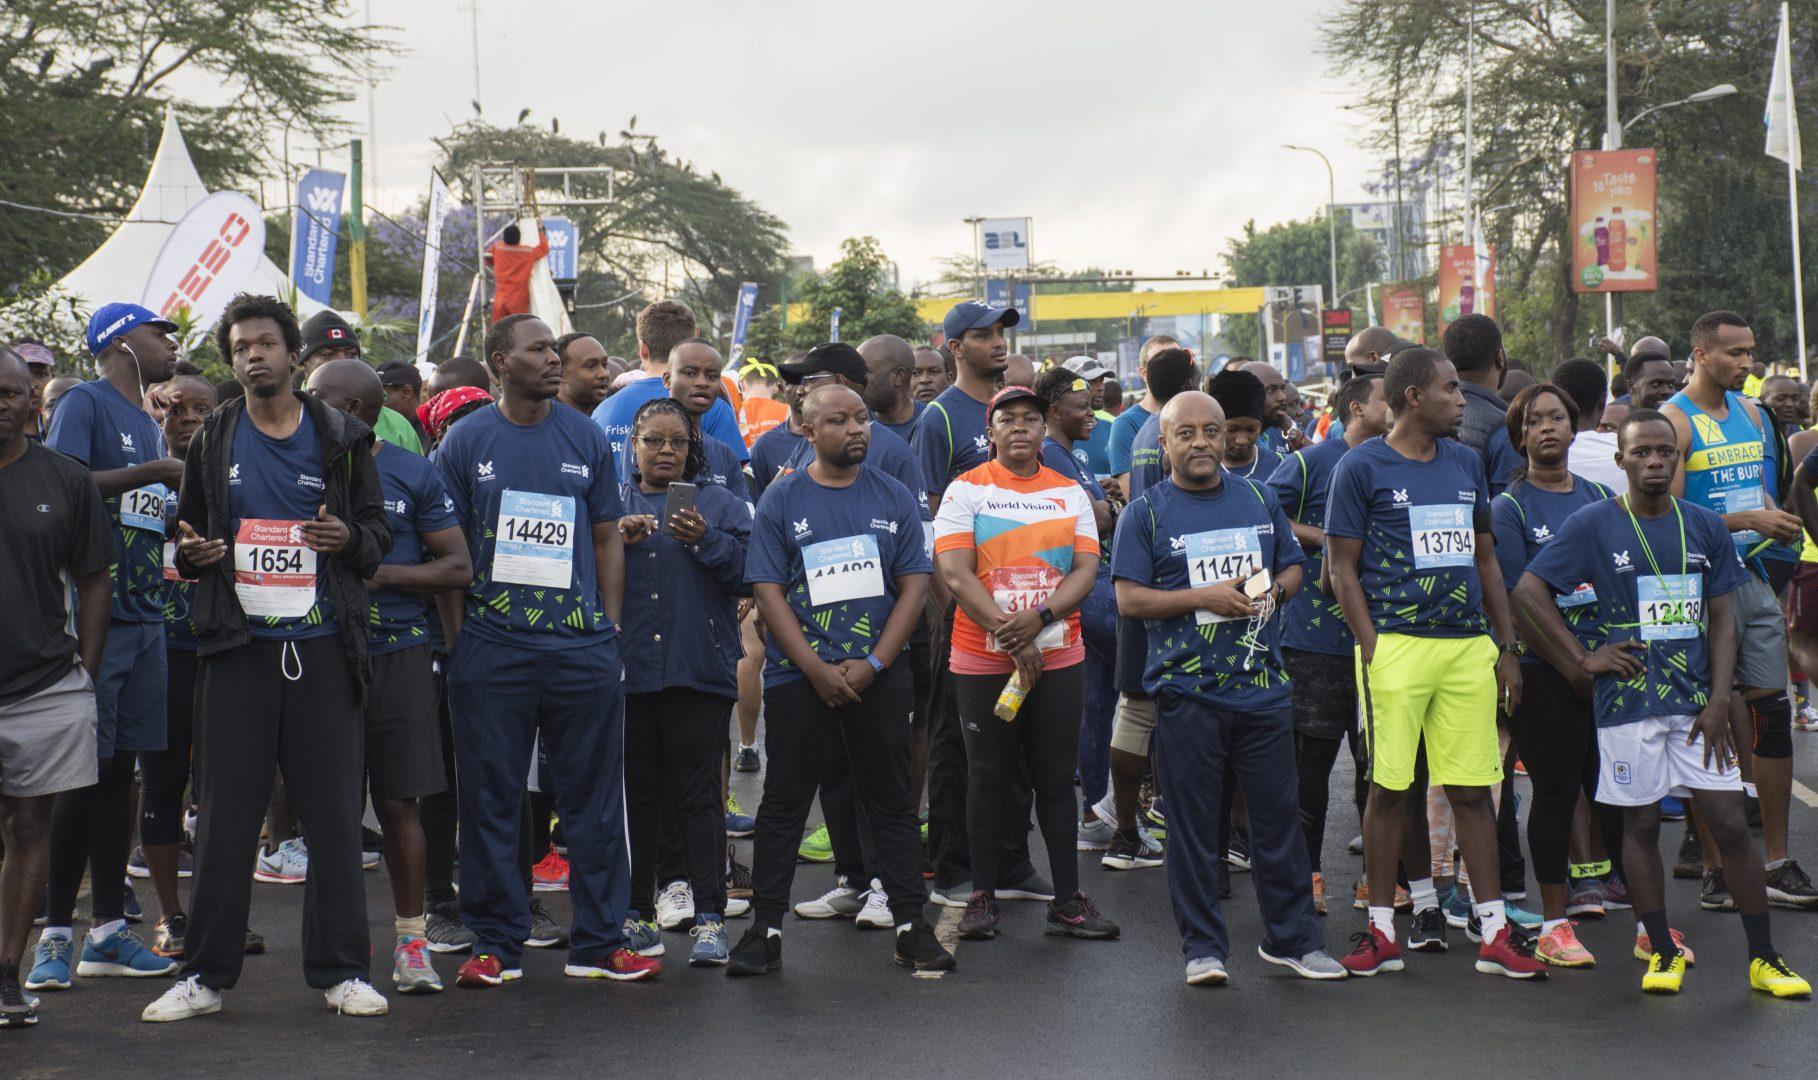 https://www.nairobimarathon.com/wp-content/uploads/2021/07/DSC_2862.jpg